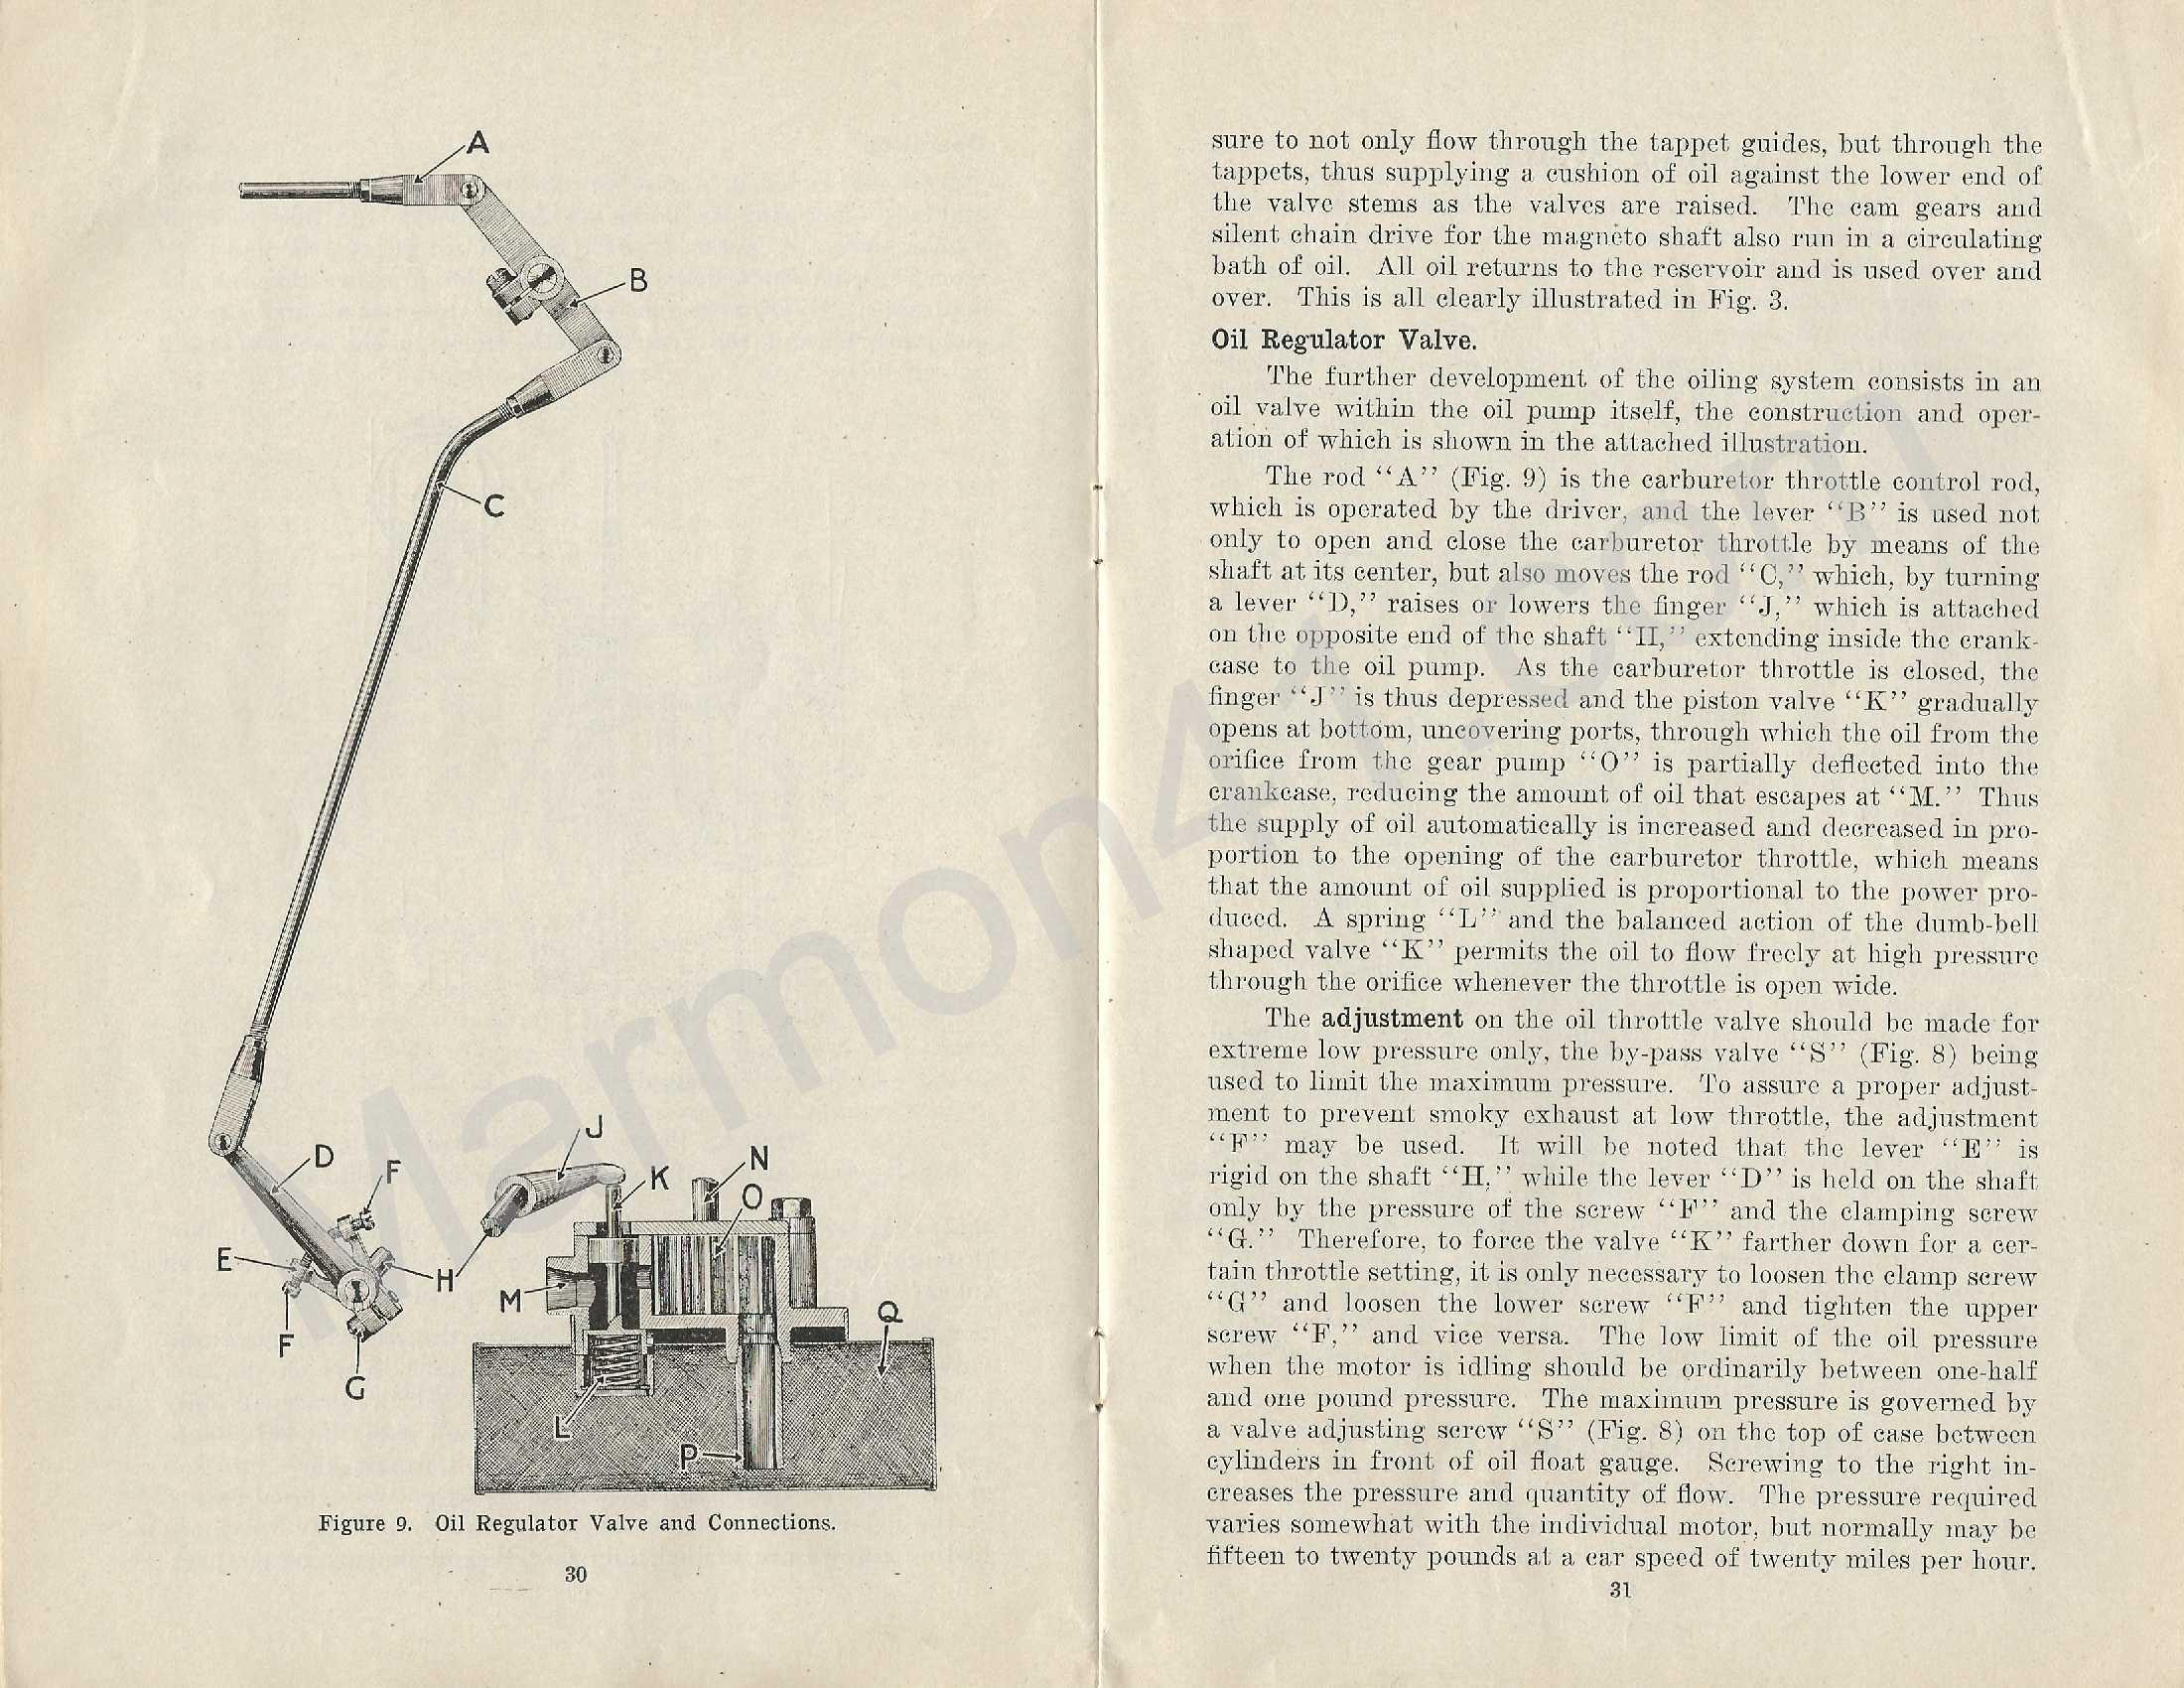 1915-07-01_Marmon41_Info_Book_1534-B_17